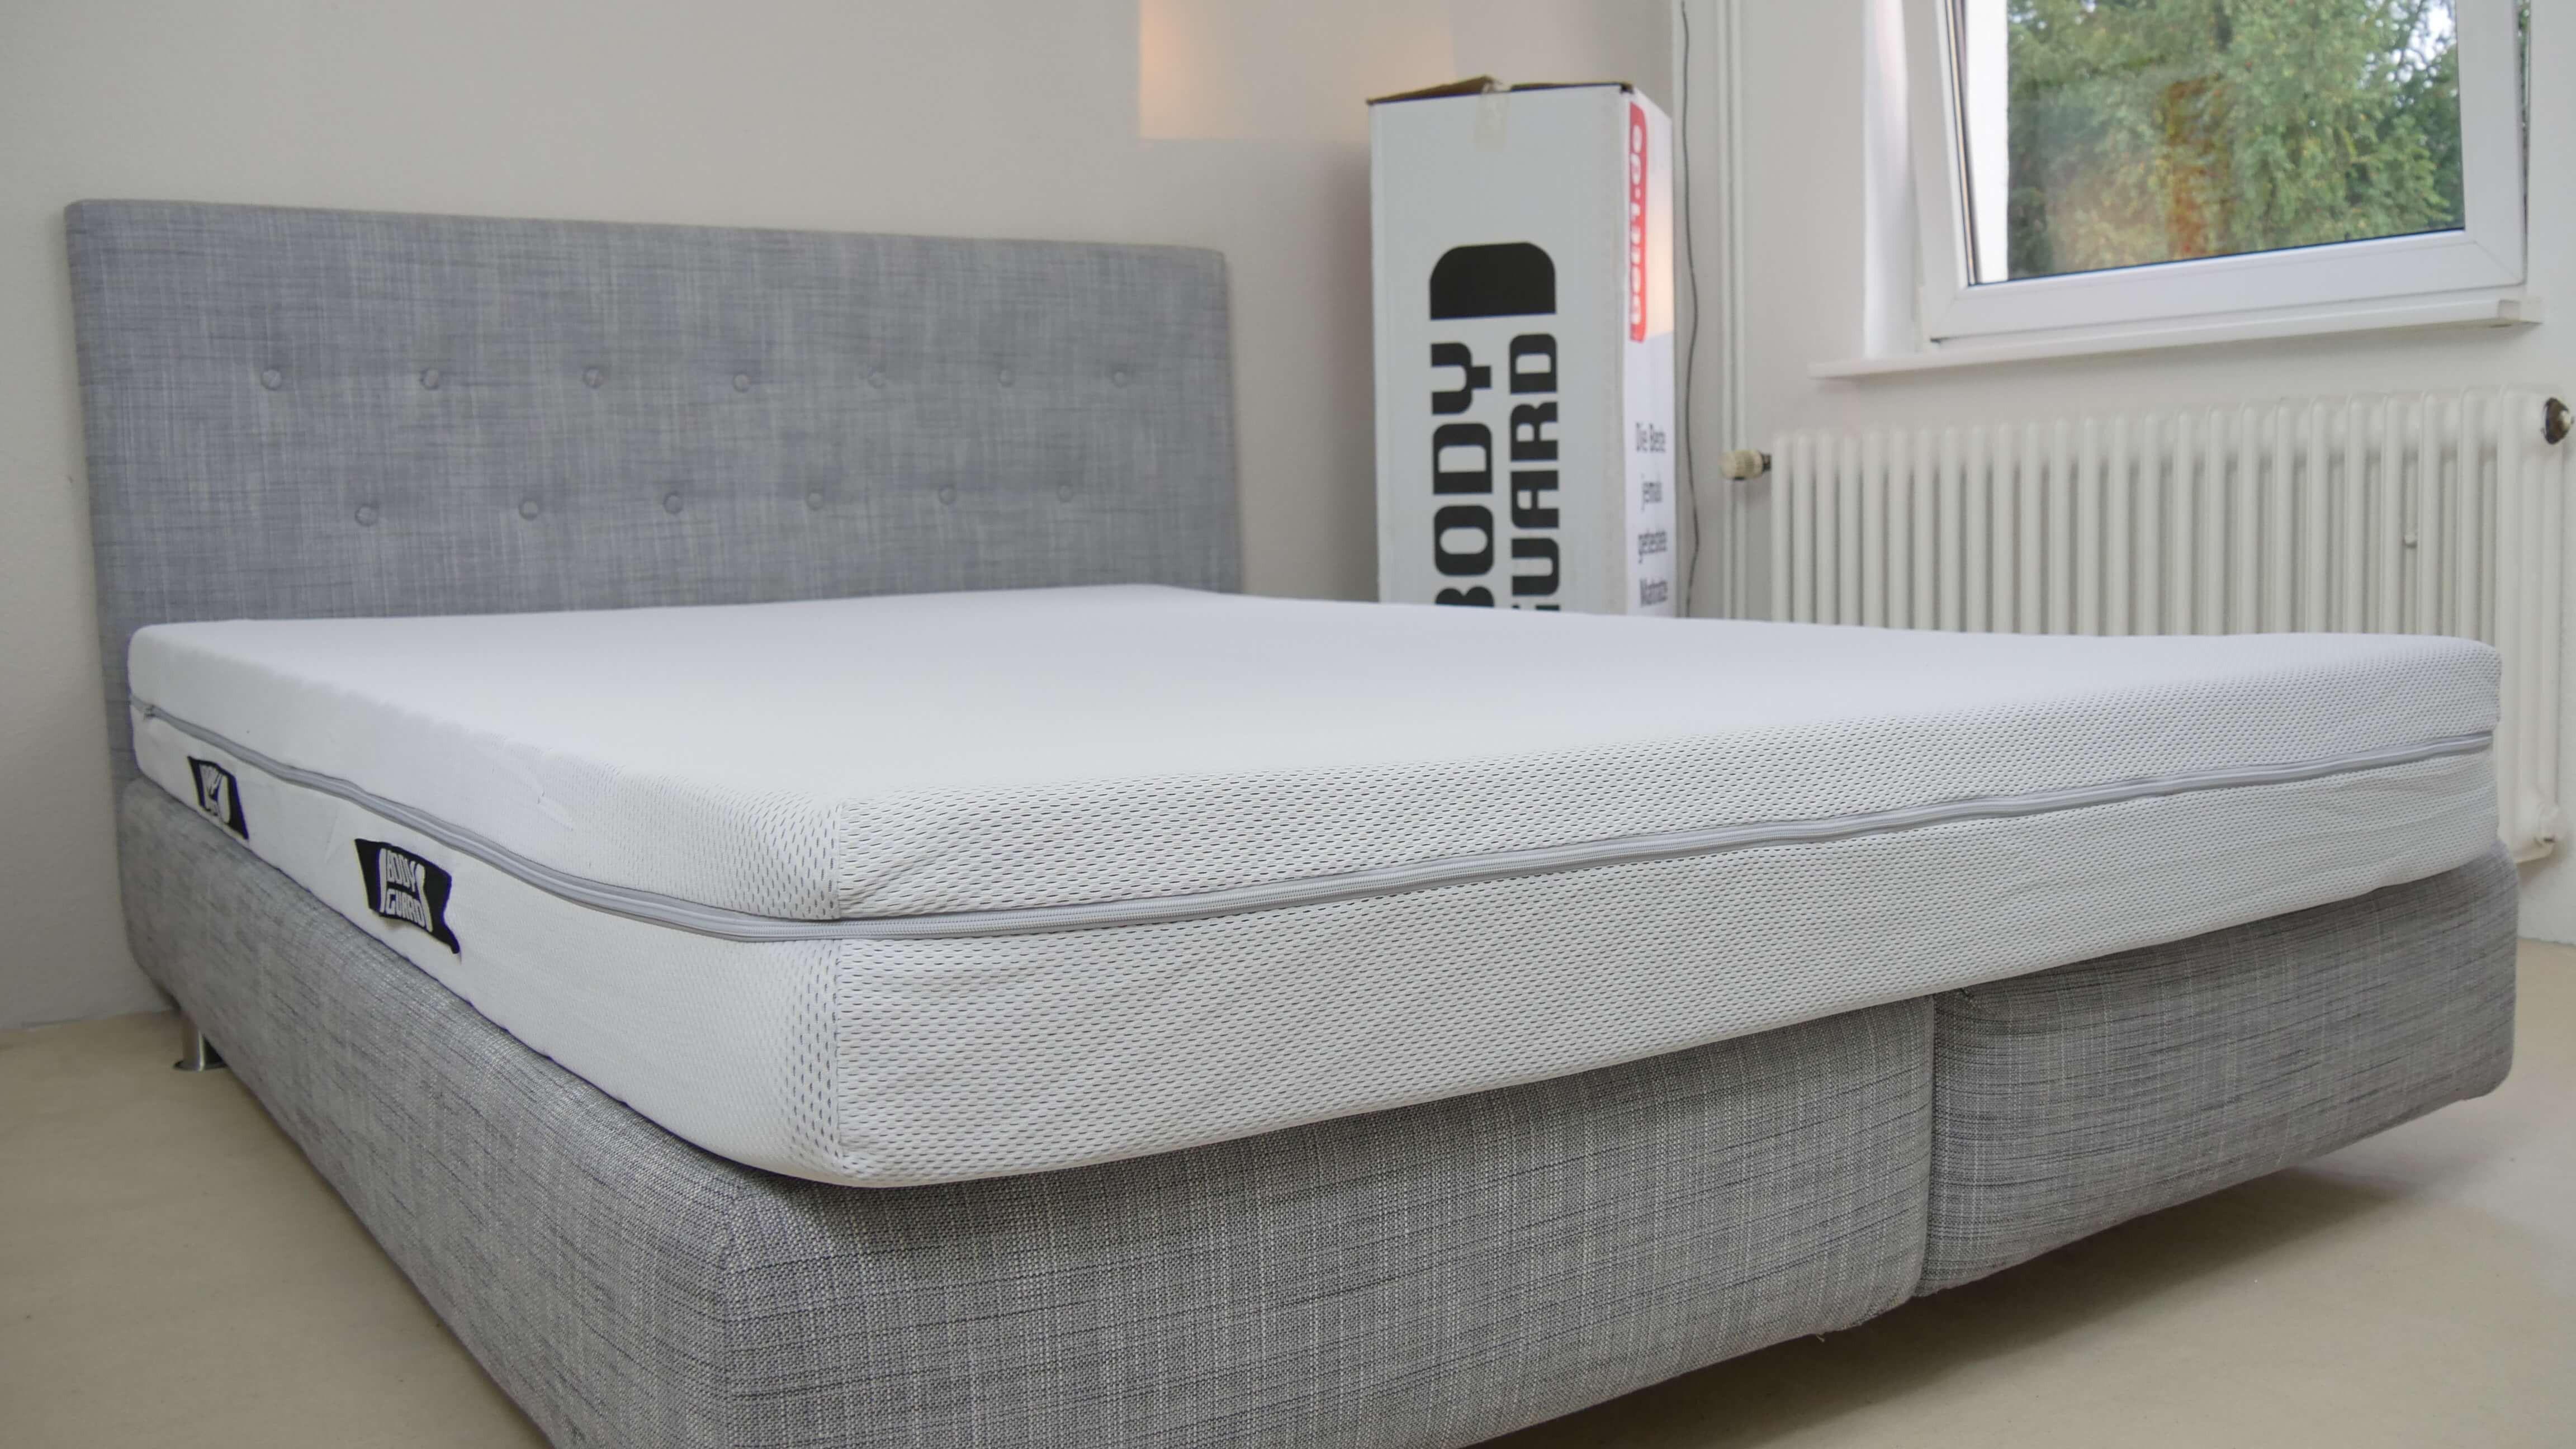 Matratzen Testsieger Awesome Bodyguard Matratze Wo Kaufen In 2020 Gel Foam Mattress Mattress Gel Foam